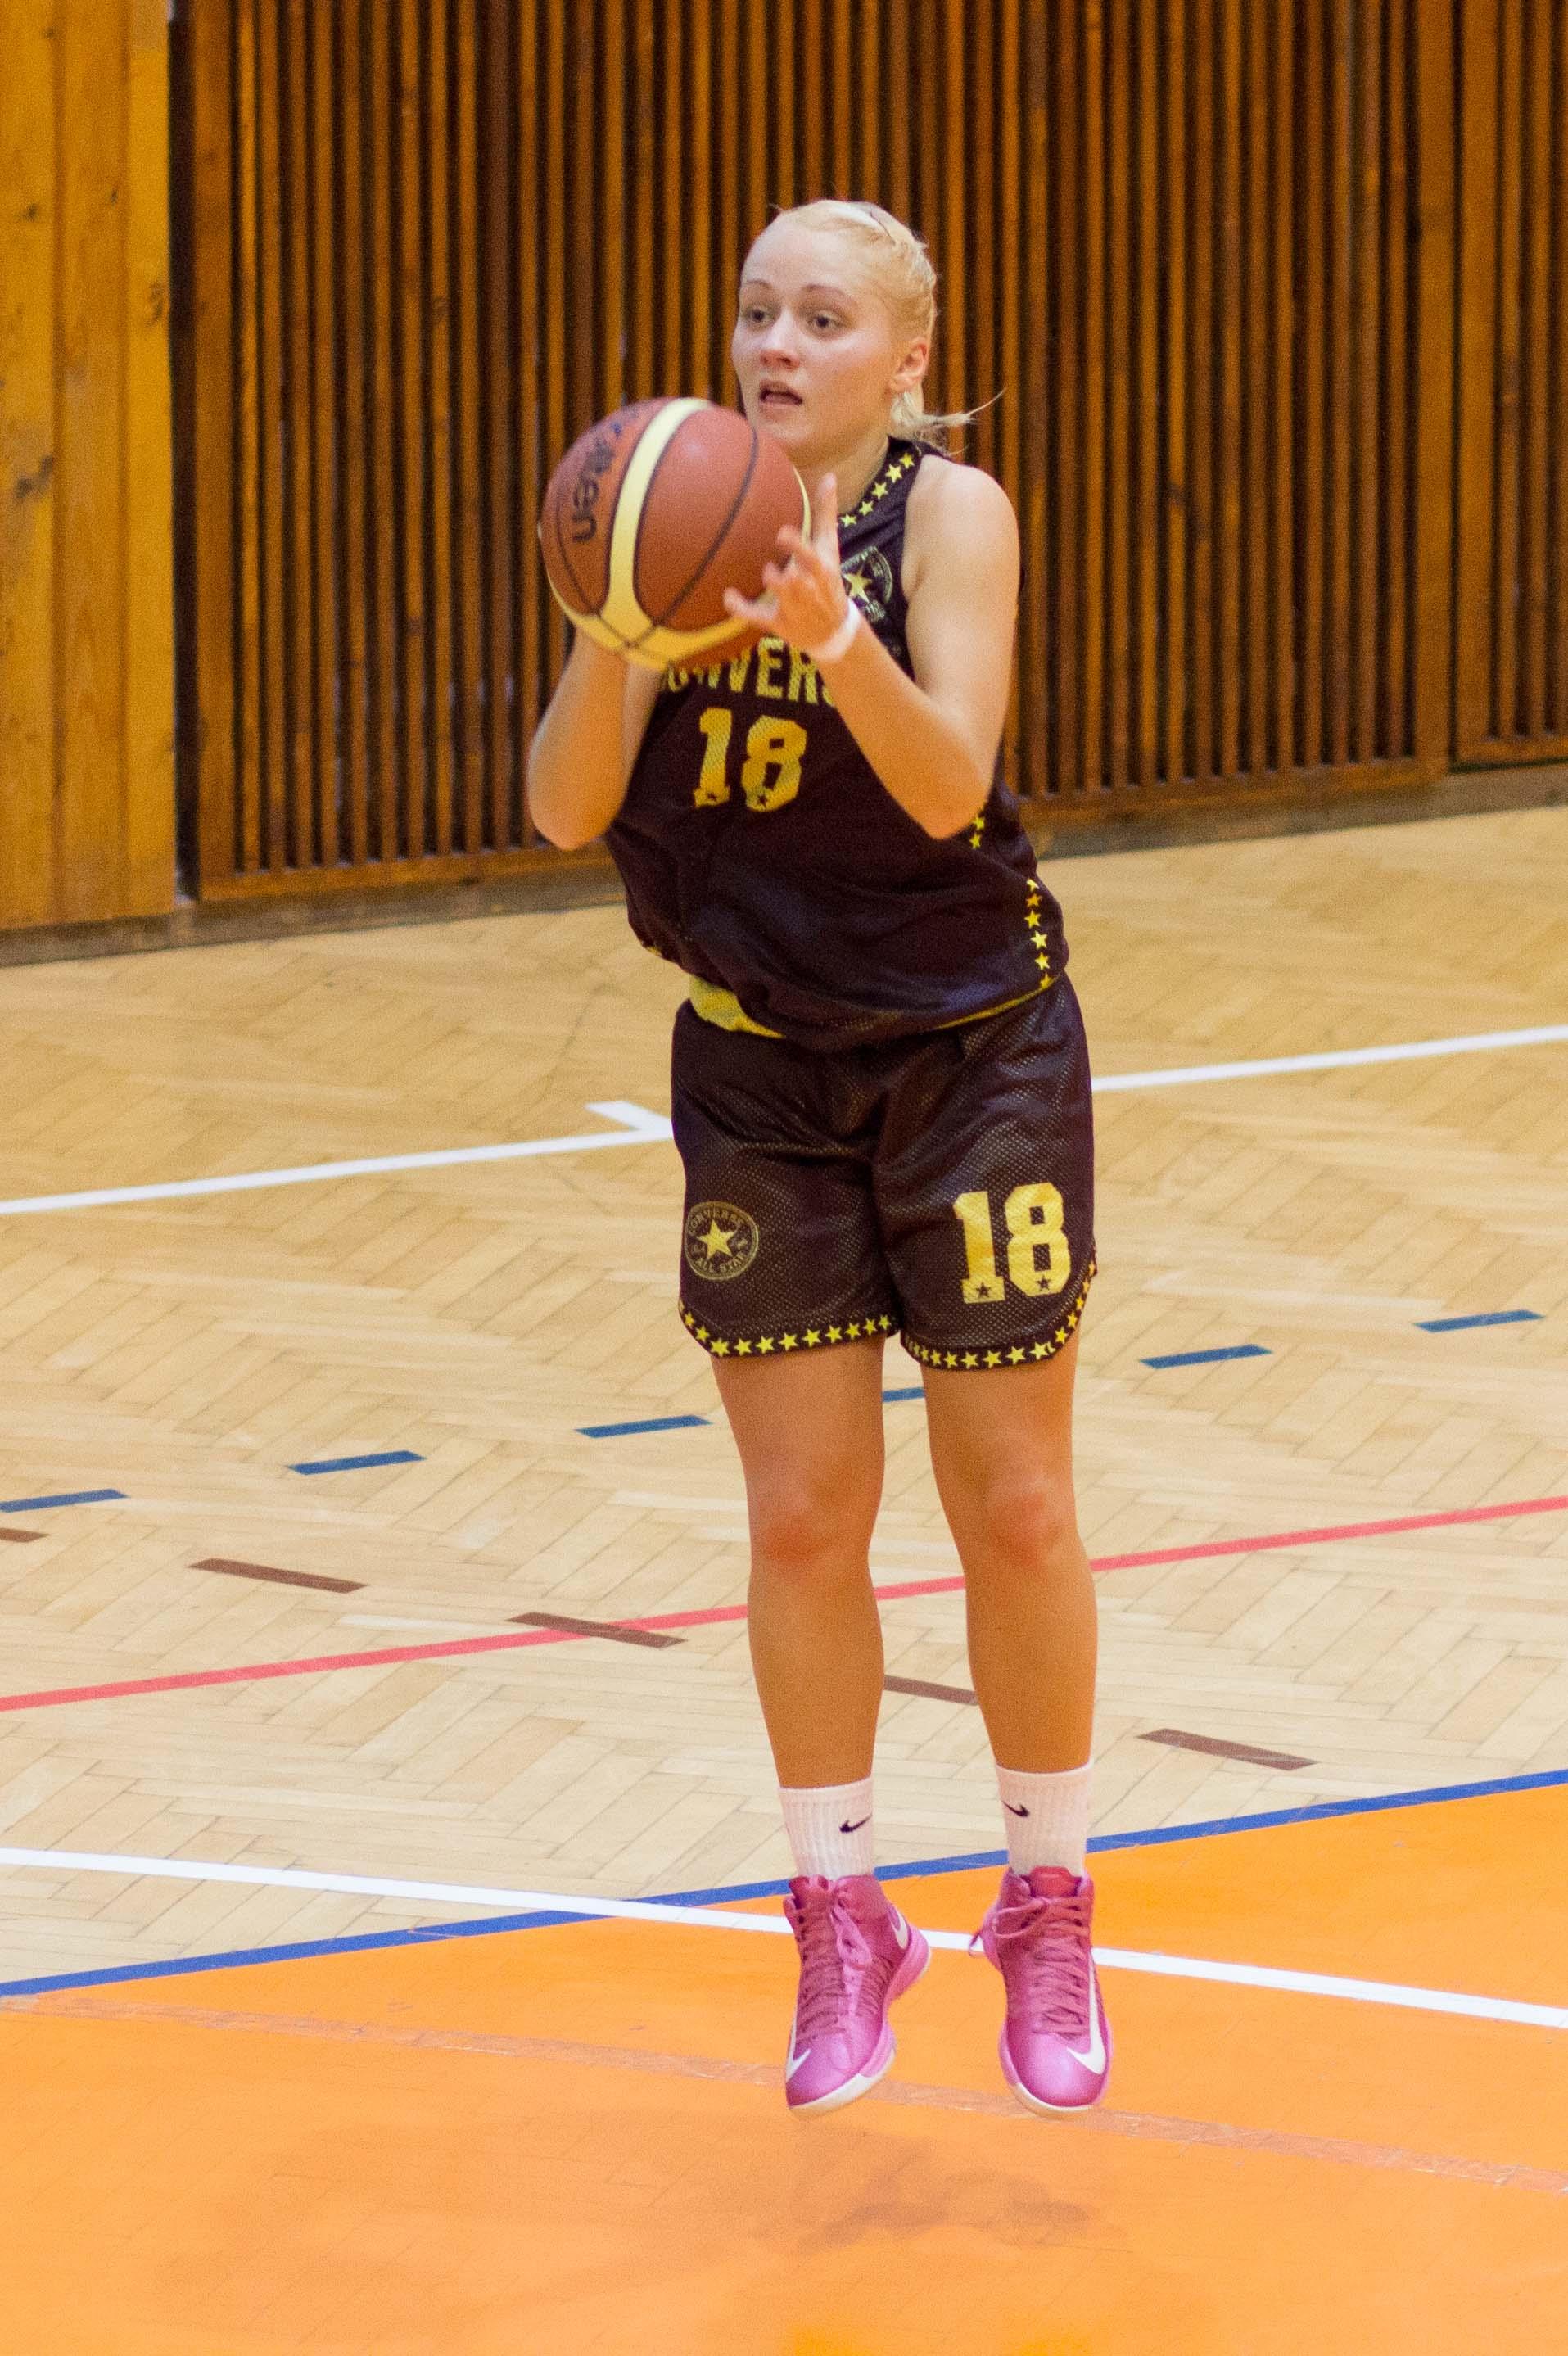 bk-zvolen-cbk-kosice-juniorky-2012-basketbal-3